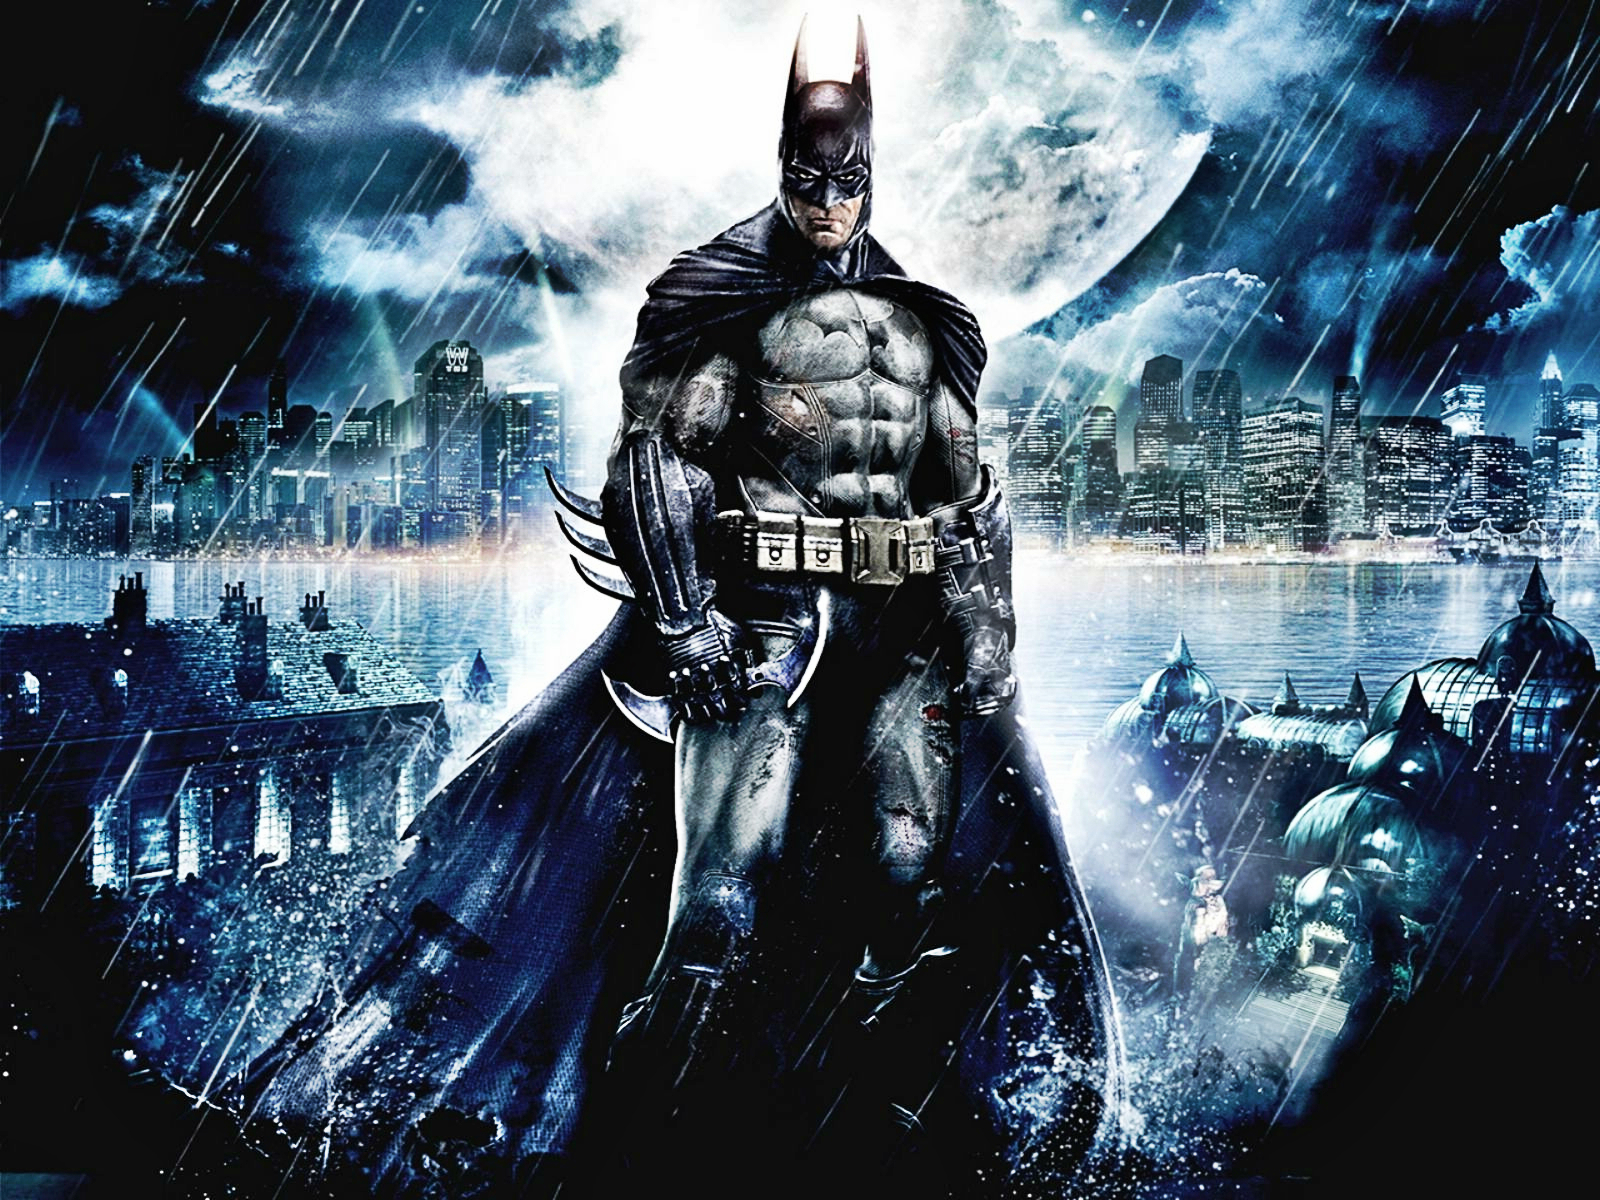 71+ Batman Hd Wallpapers on WallpaperSafari